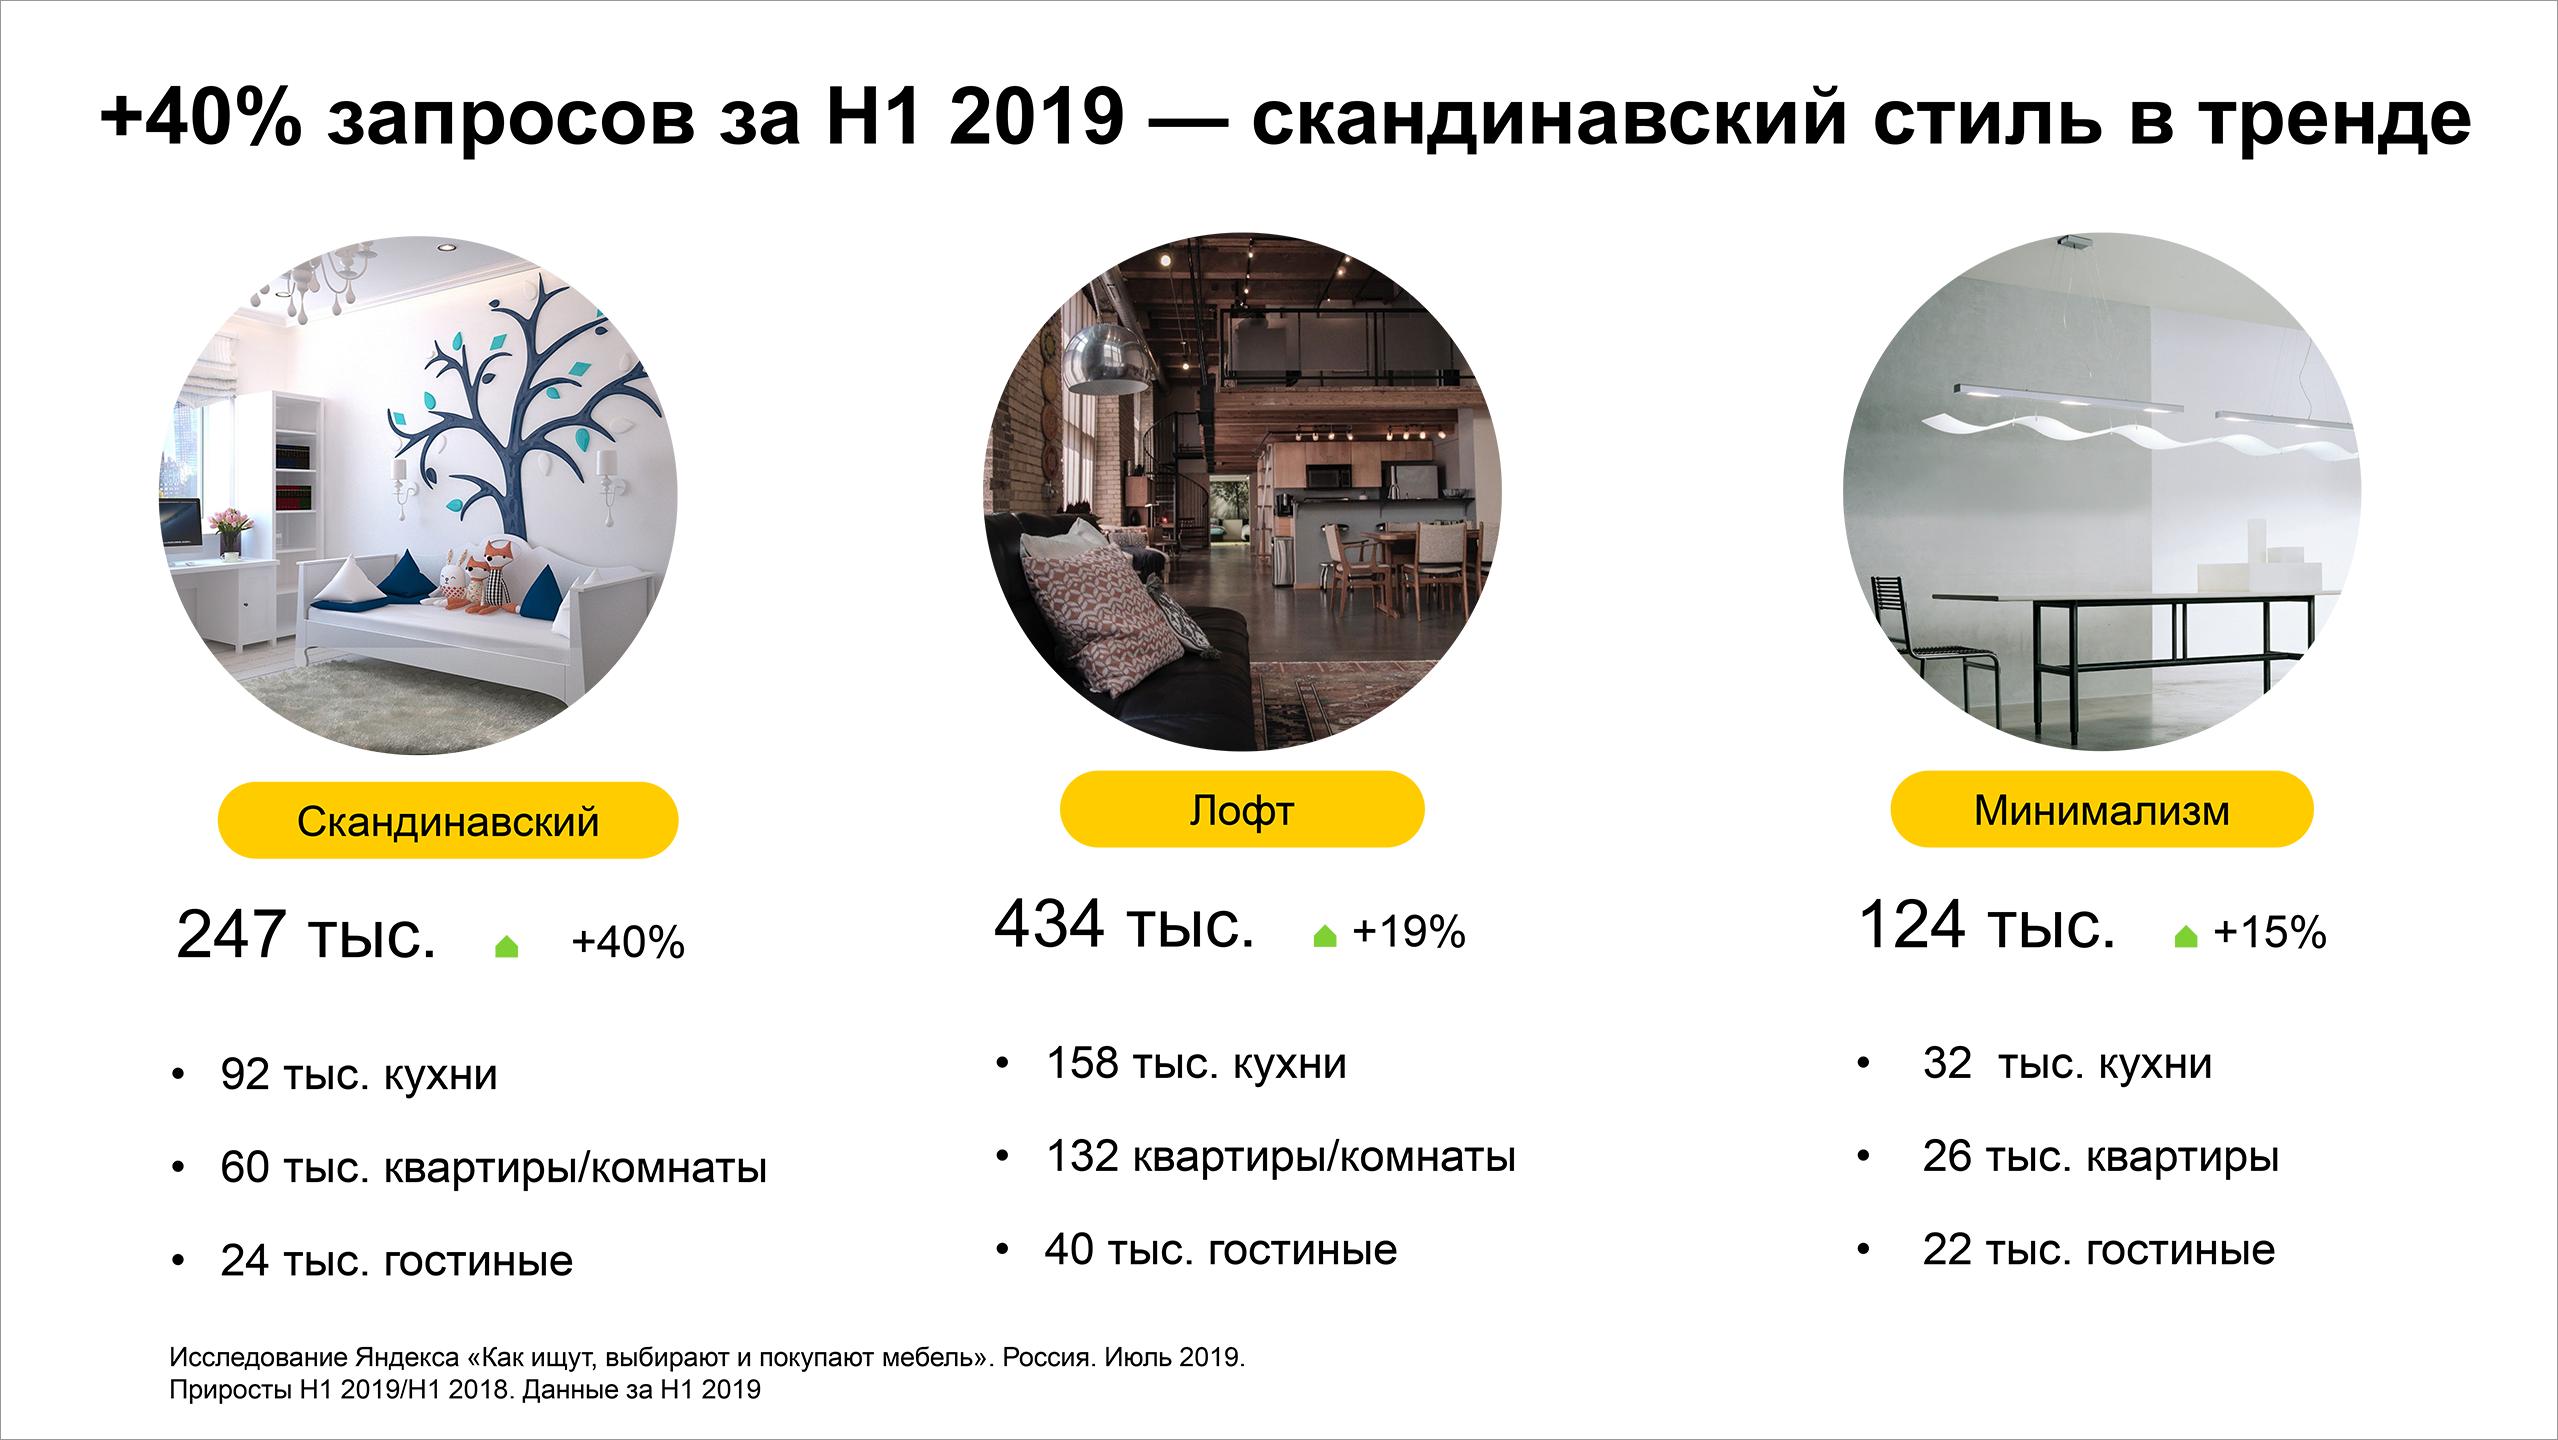 +40% запросов за H1 2019 — скандинавский стиль в тренде